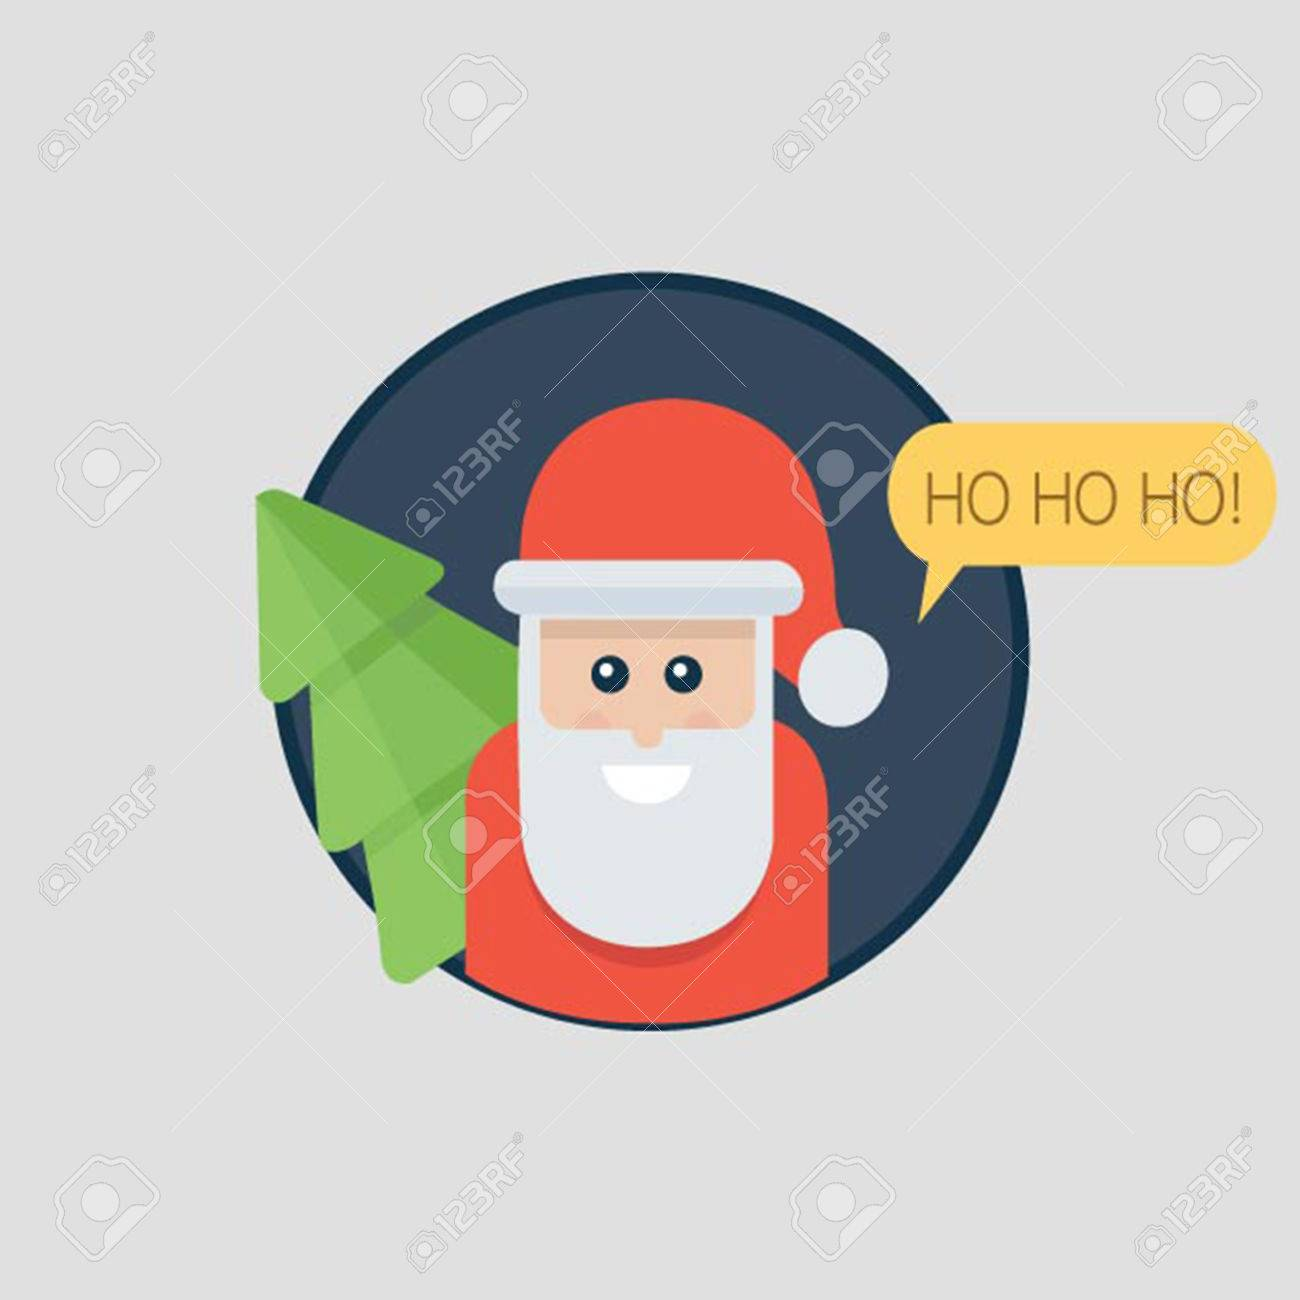 Santa Claus Ho Ho Ho. Christmas Card With Santa Holding Christmas ...